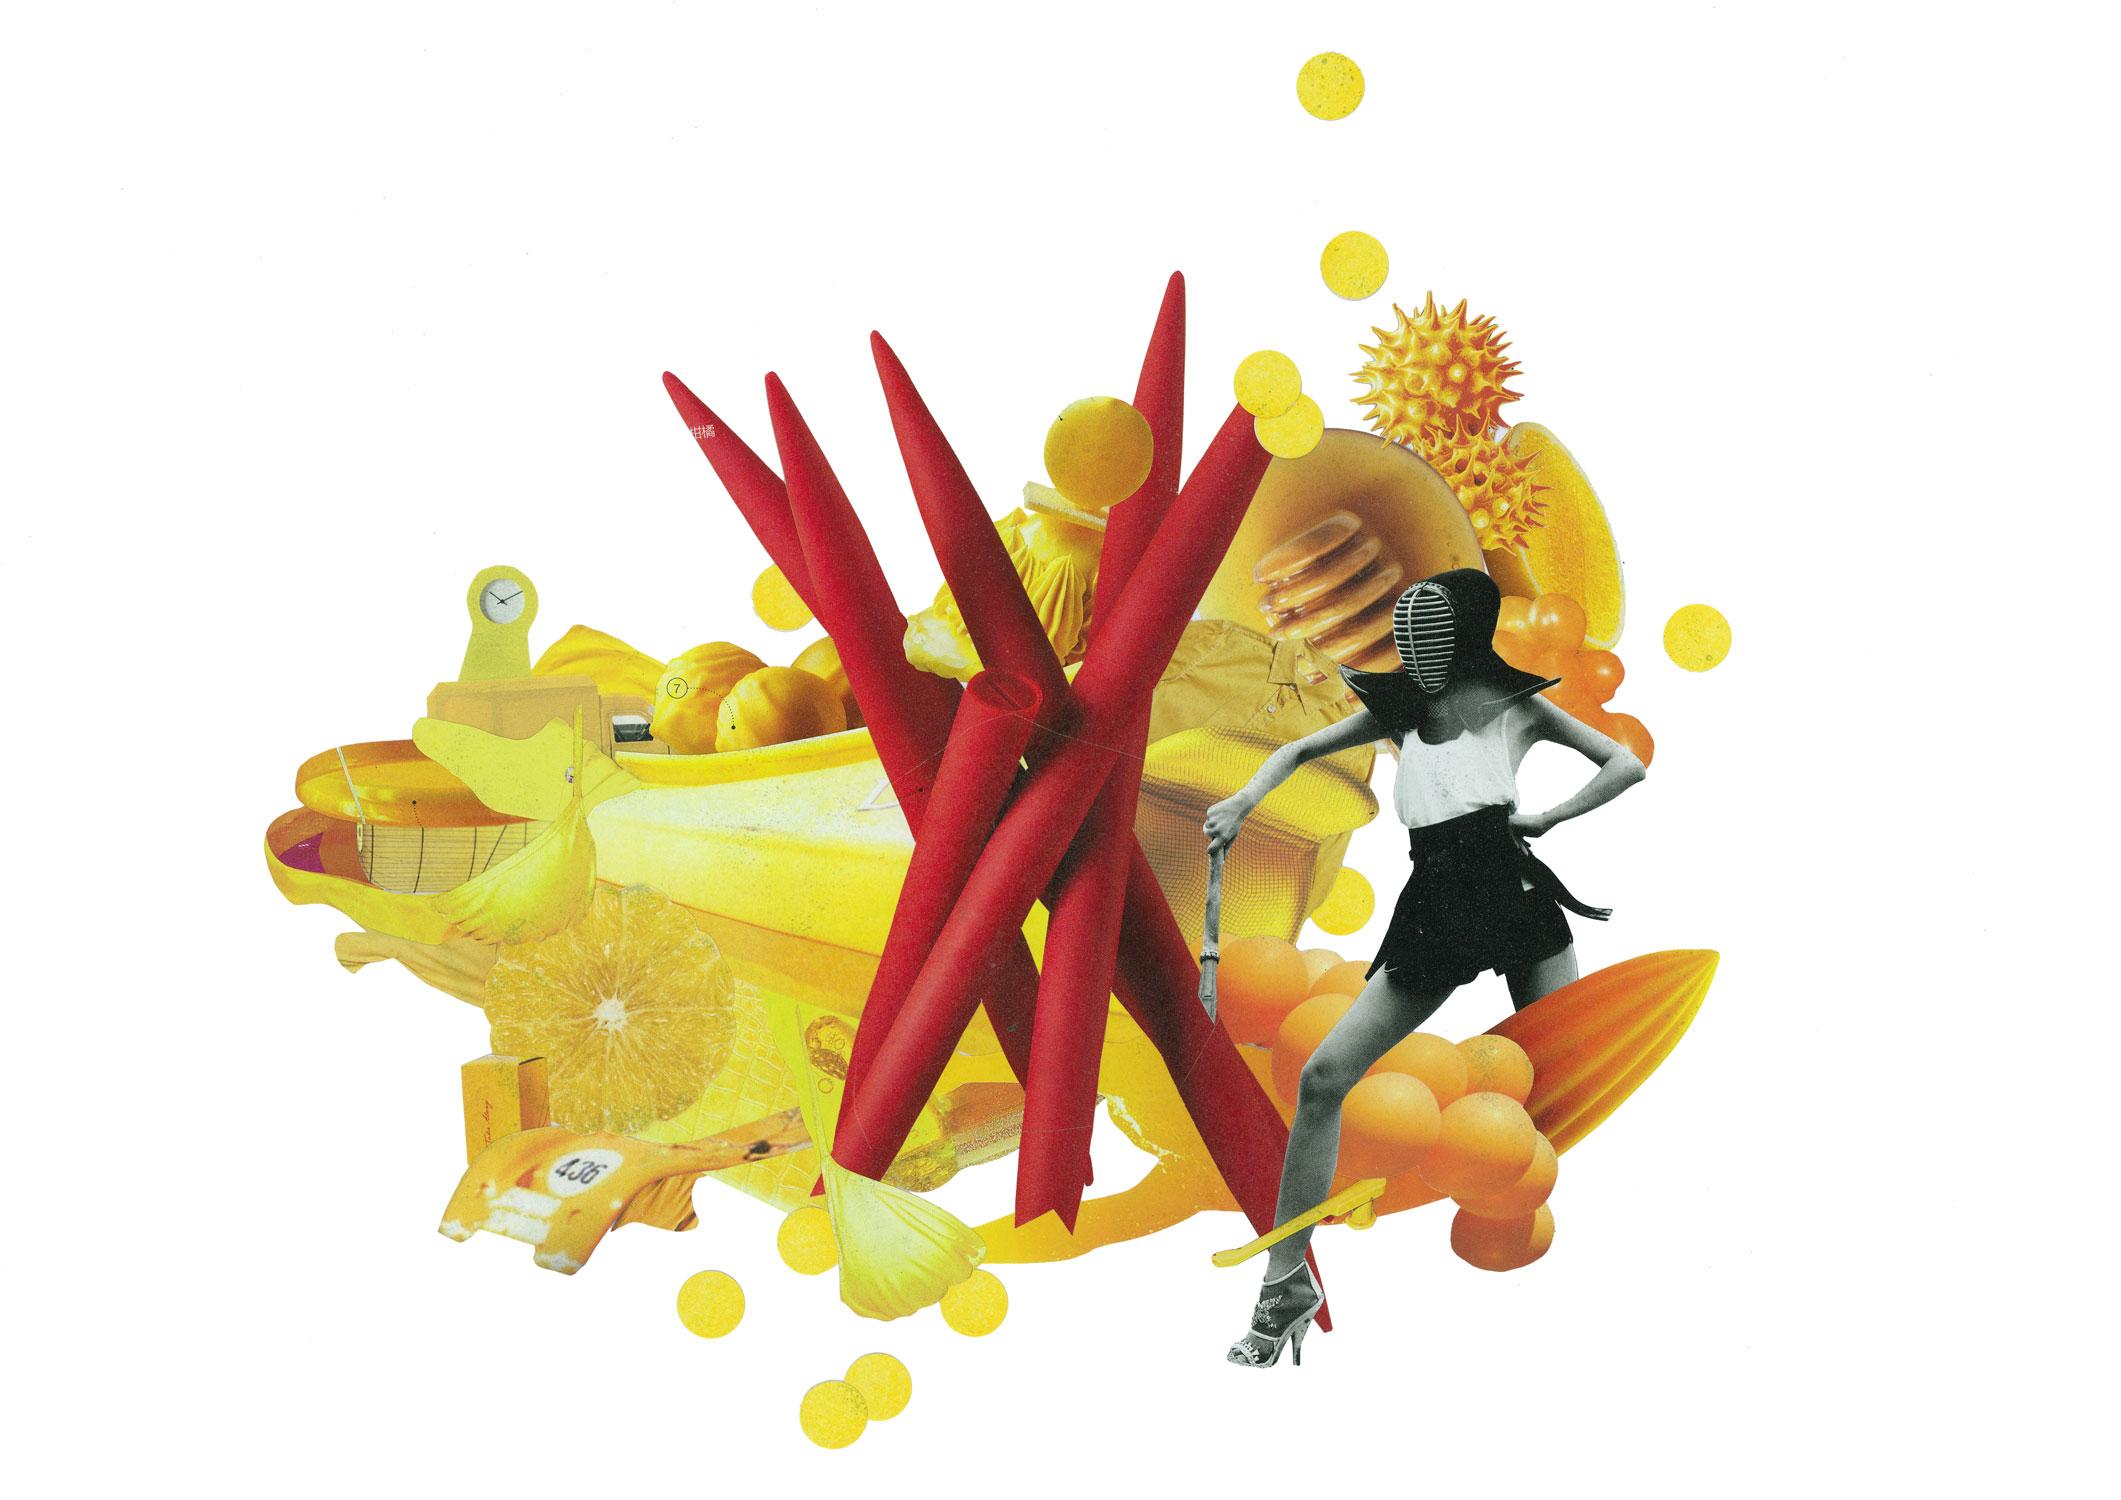 Kate-Yurk-Cutting-Down-That-Damn-Lemon-Tree2.jpg